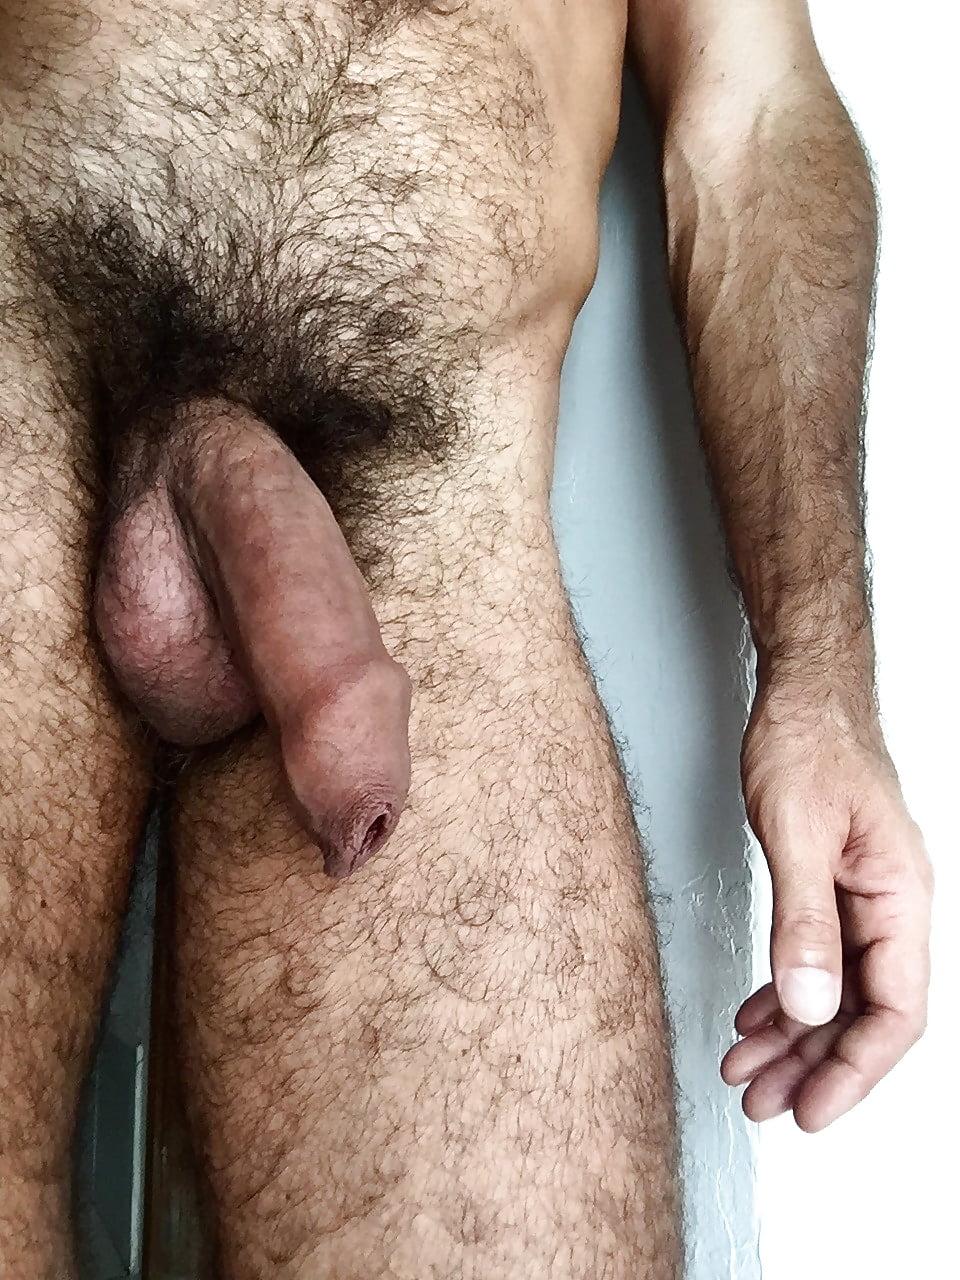 shaved-vs-hairy-cocks